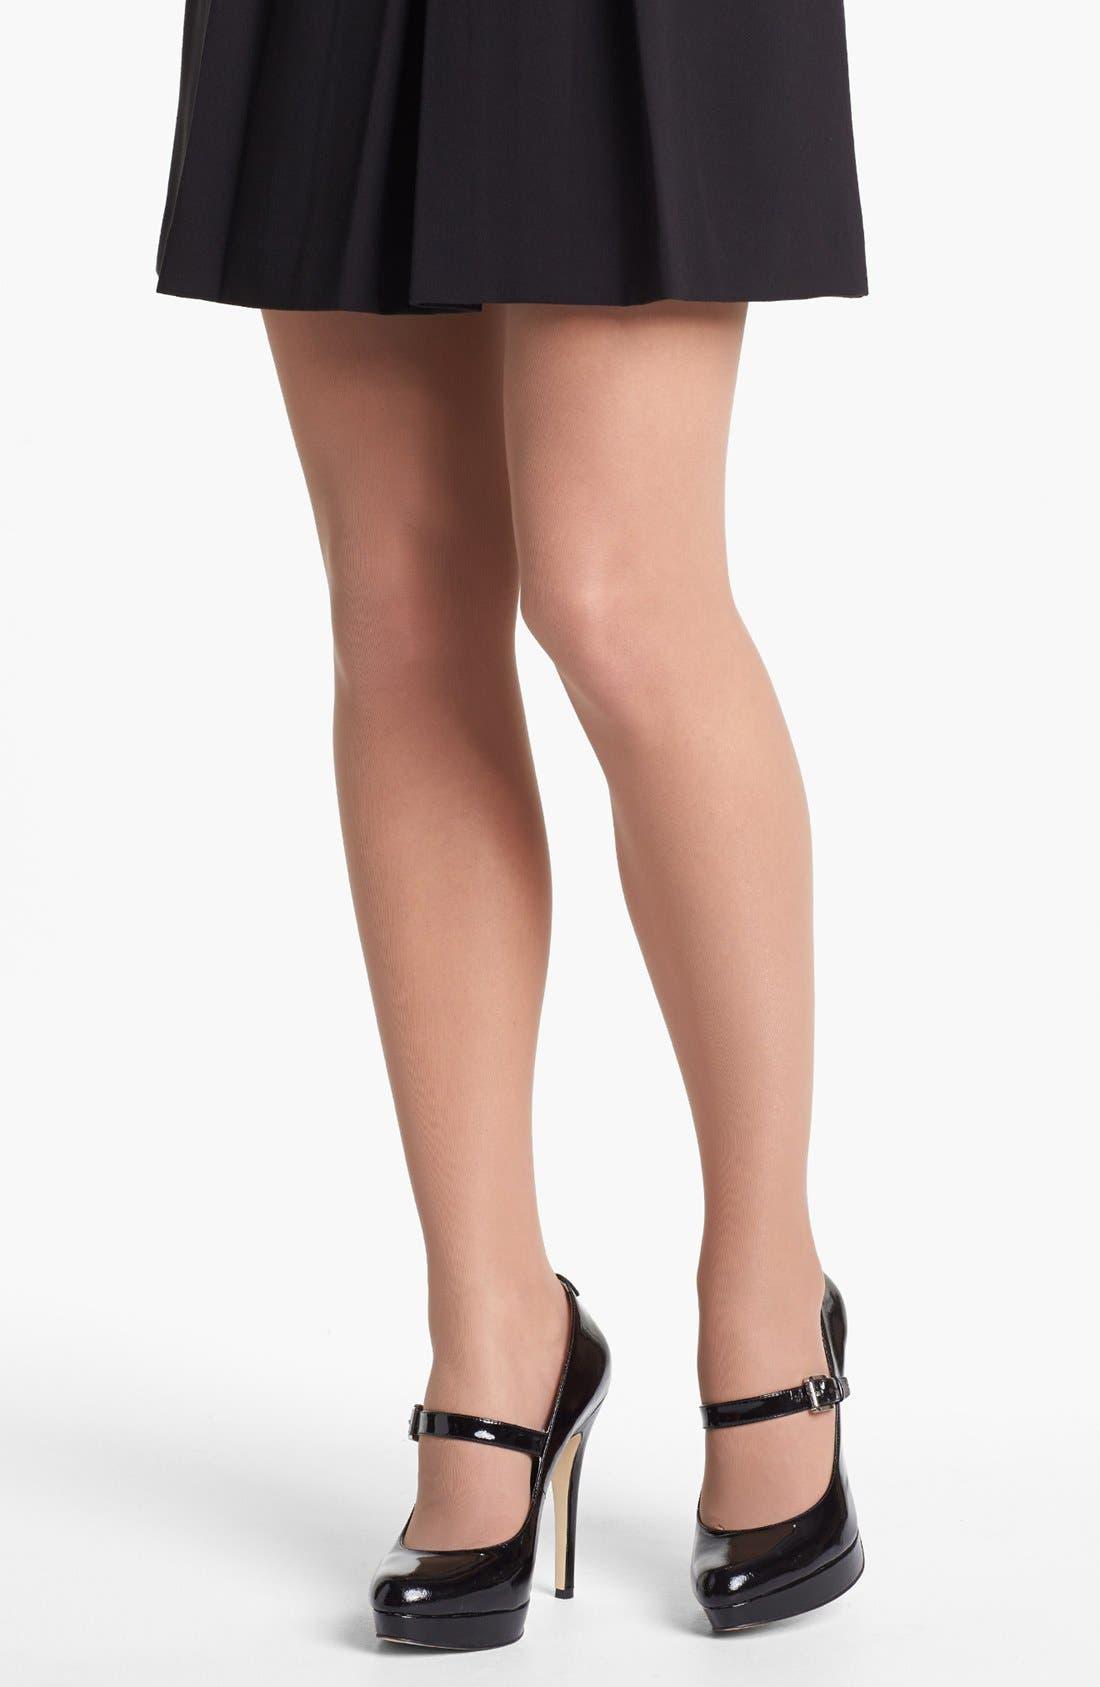 Alternate Image 1 Selected - Donna Karan 'Evolution' Ultra Sheer Pantyhose